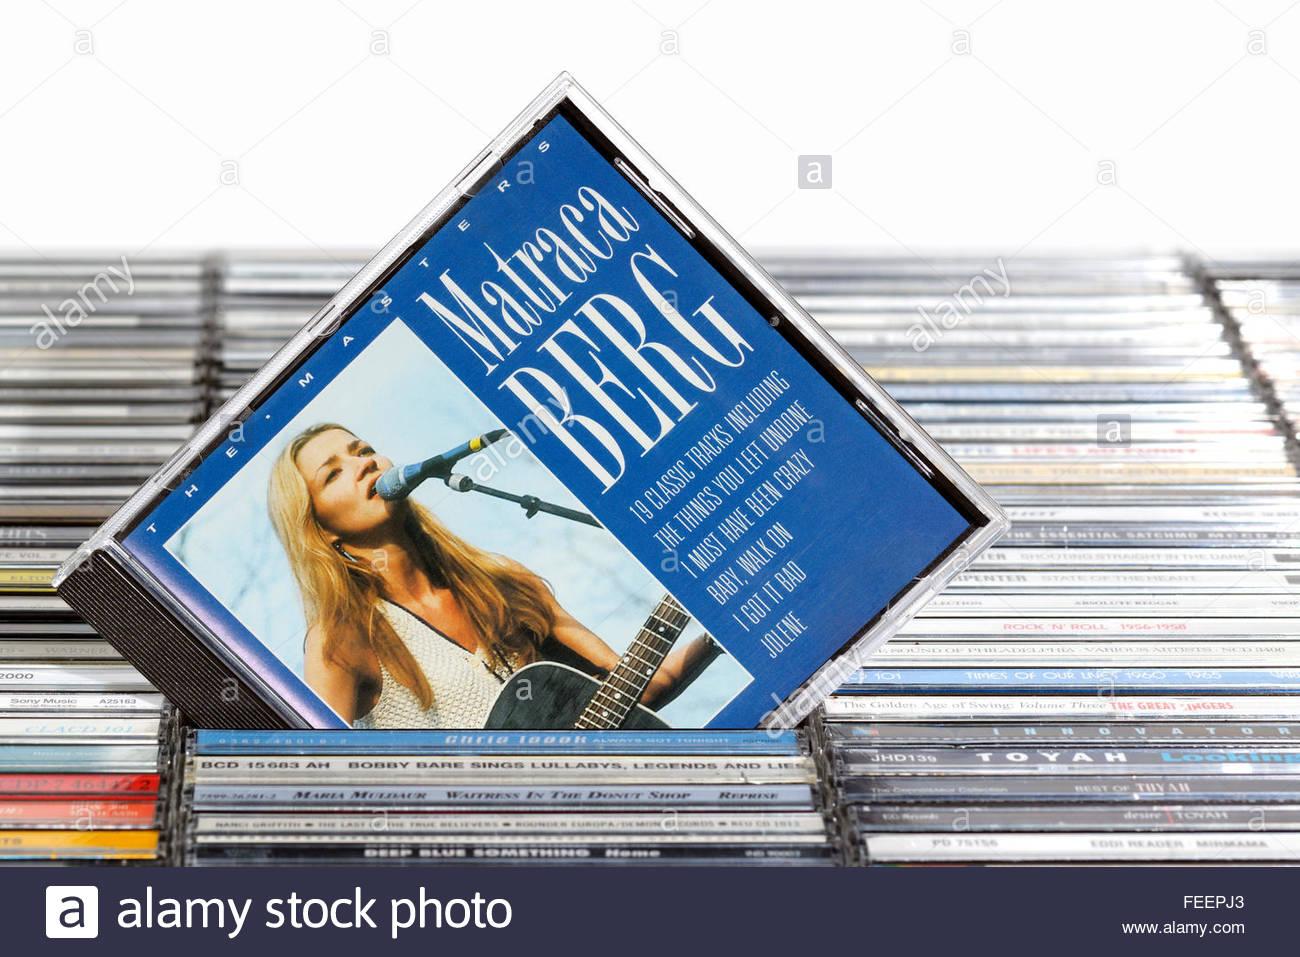 Matraca Berg greatest hits album, piled music CD cases, Dorset England Stock Photo